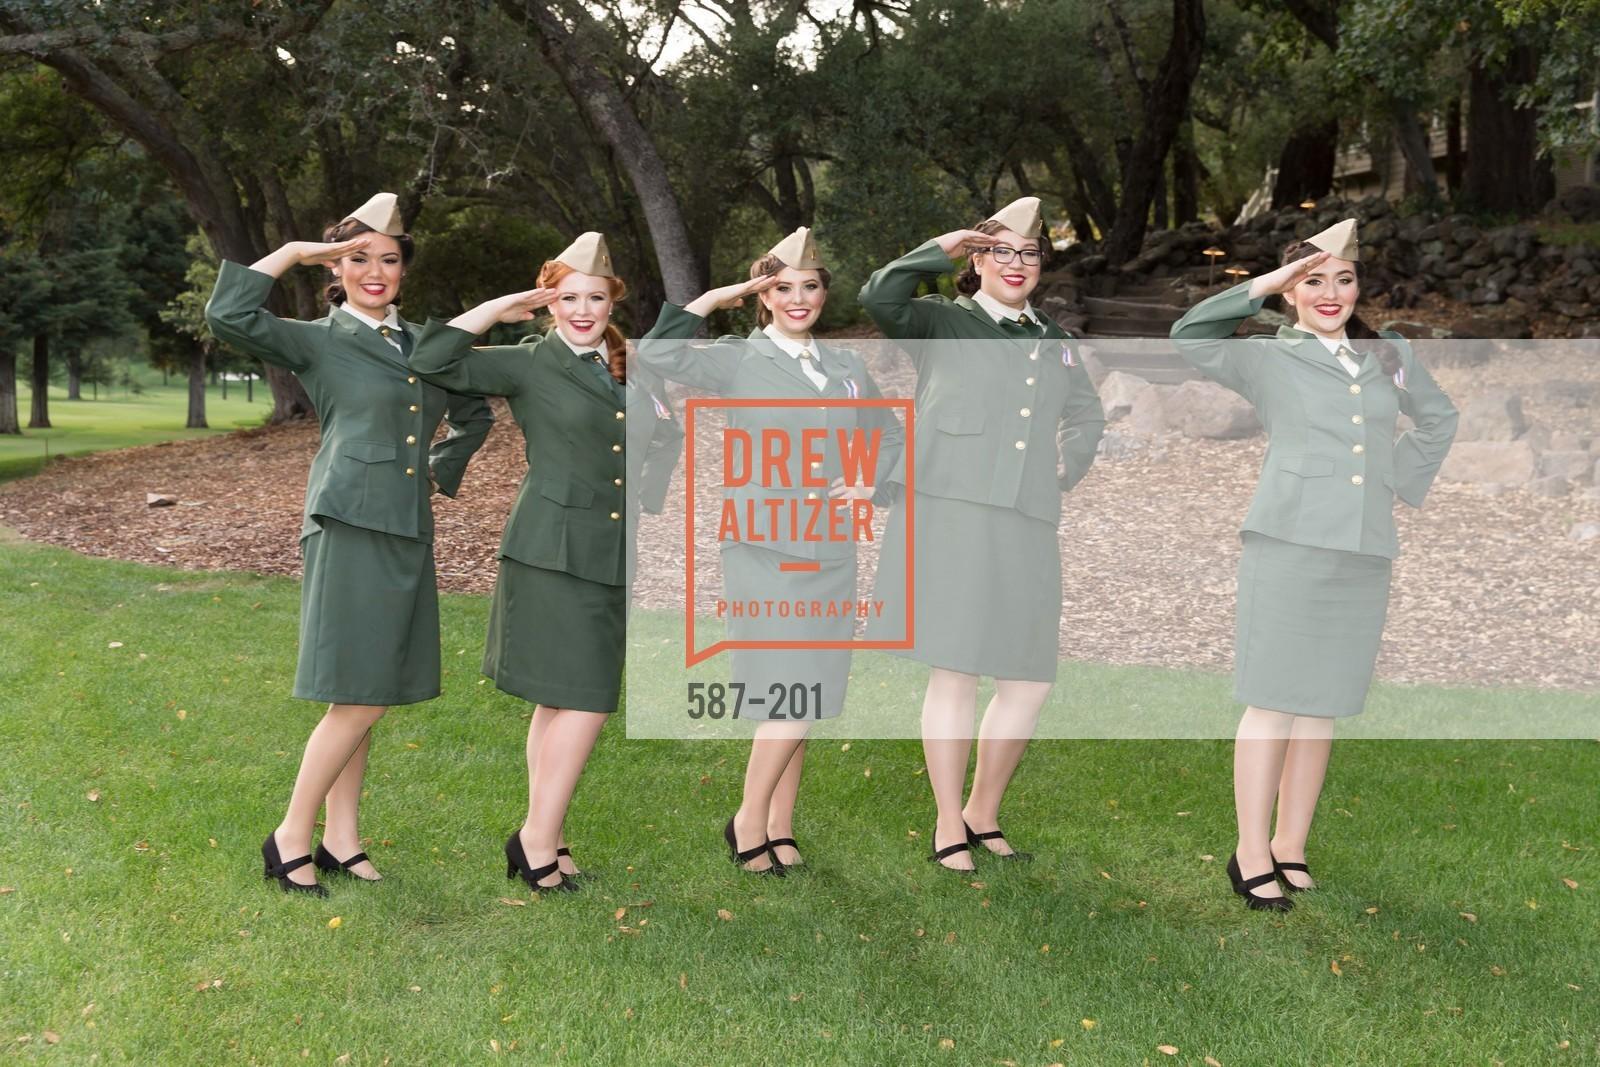 Sharon Chudnow, Courtney Cole, Kaia Kennedy, Jackie Diaz, Kaylee Baker, Photo #587-201